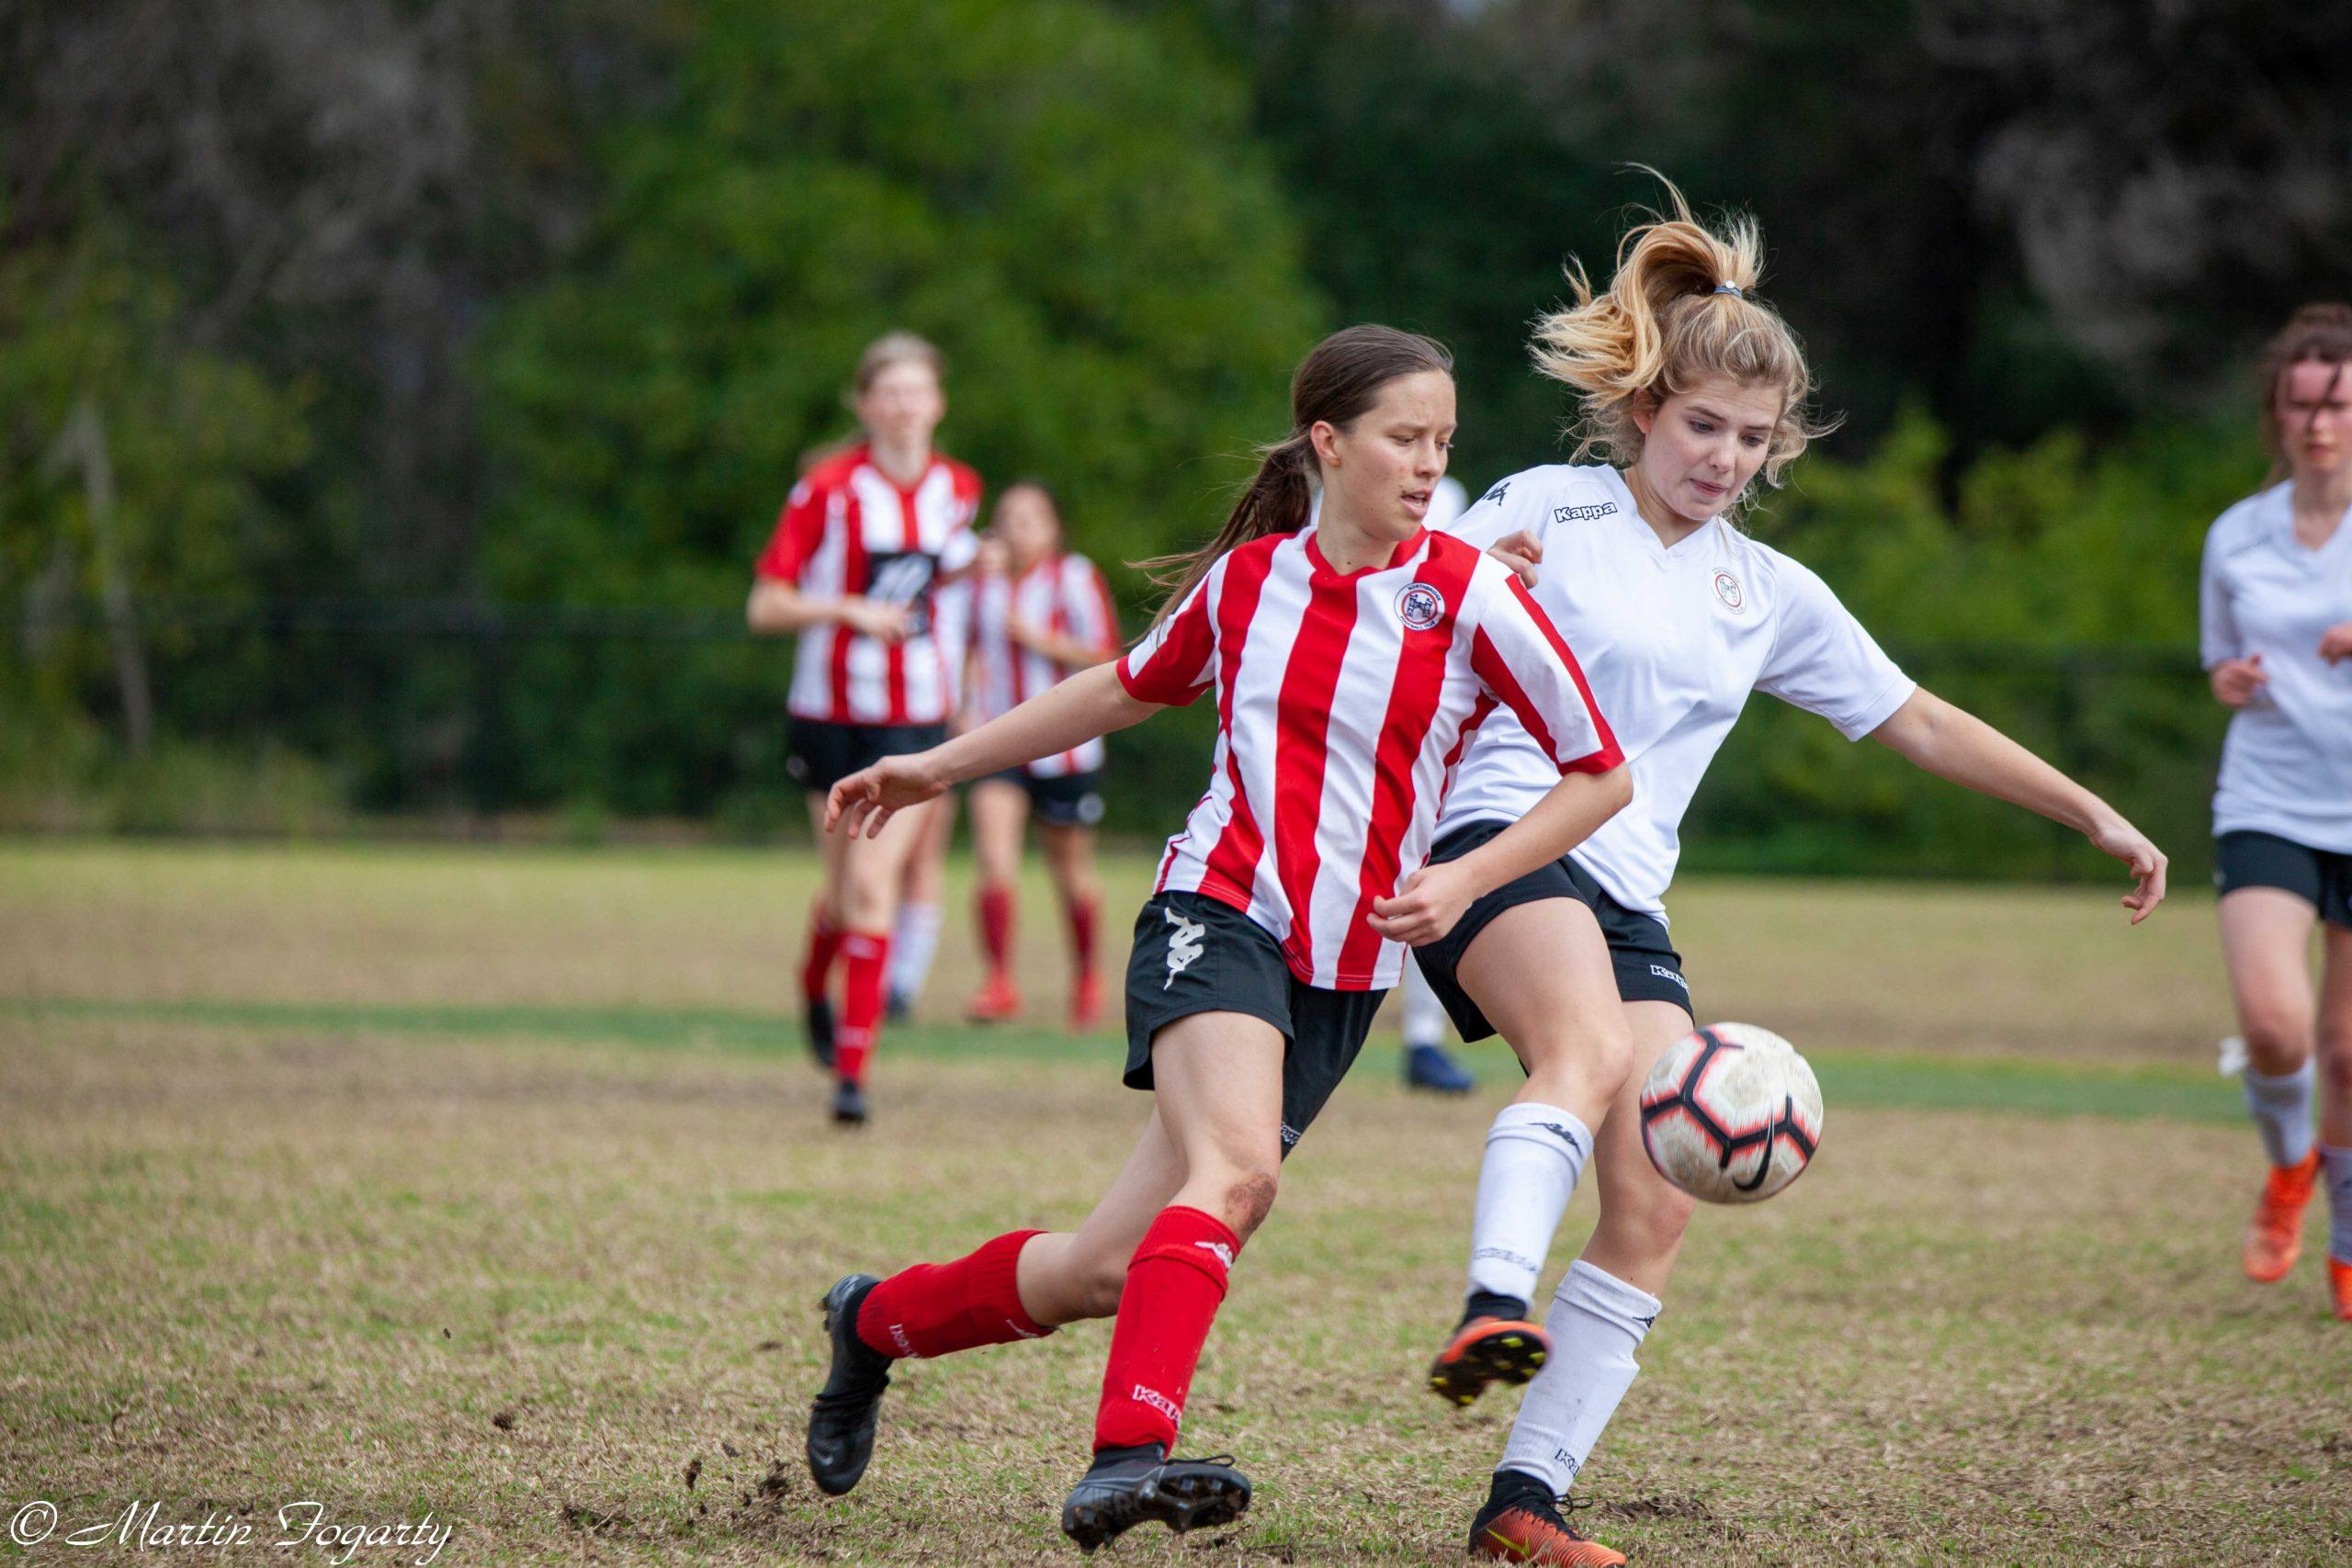 Northbridge FC U18 Diamond League teams go head-to-head